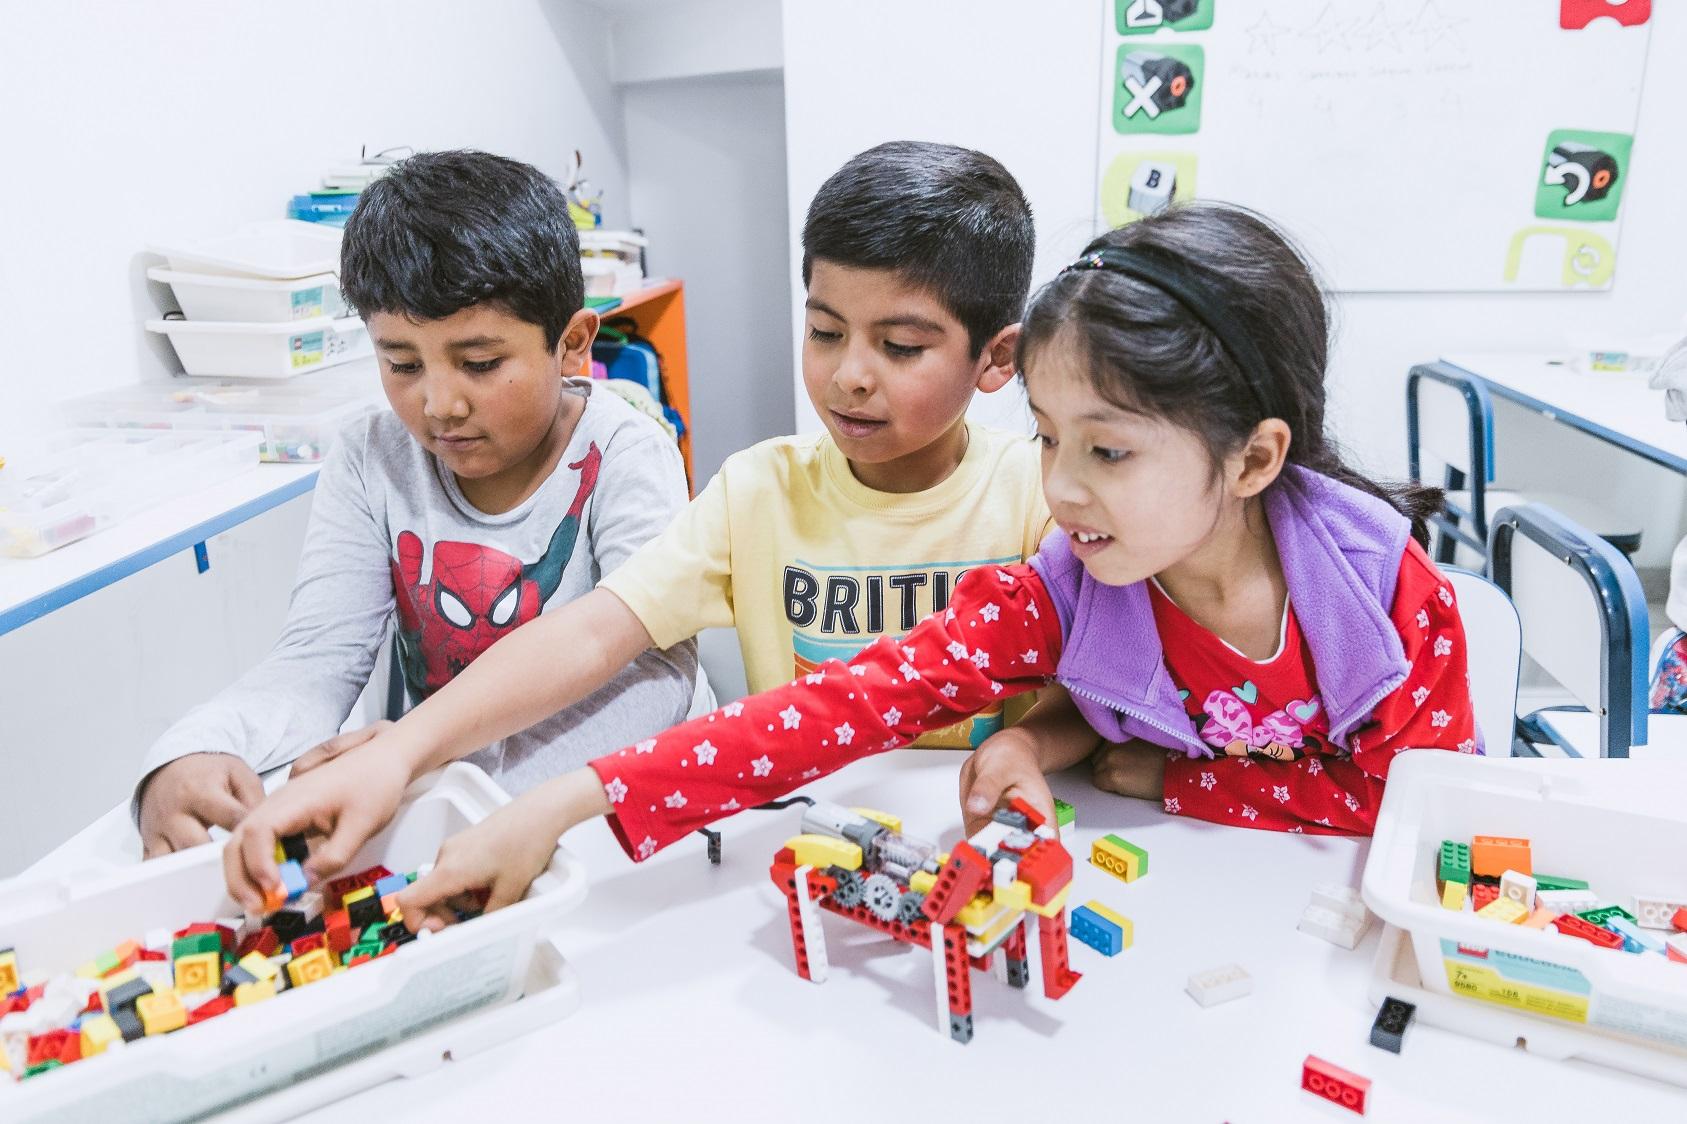 robot-aprender-ia-inteligencia-artificial-ensenar-robotica-educacion-educativa-robotics-lego-duplo-arduino-ninos-ninas-adolescentes-jovenes-cursos-clases-talleres-arequipa-peru